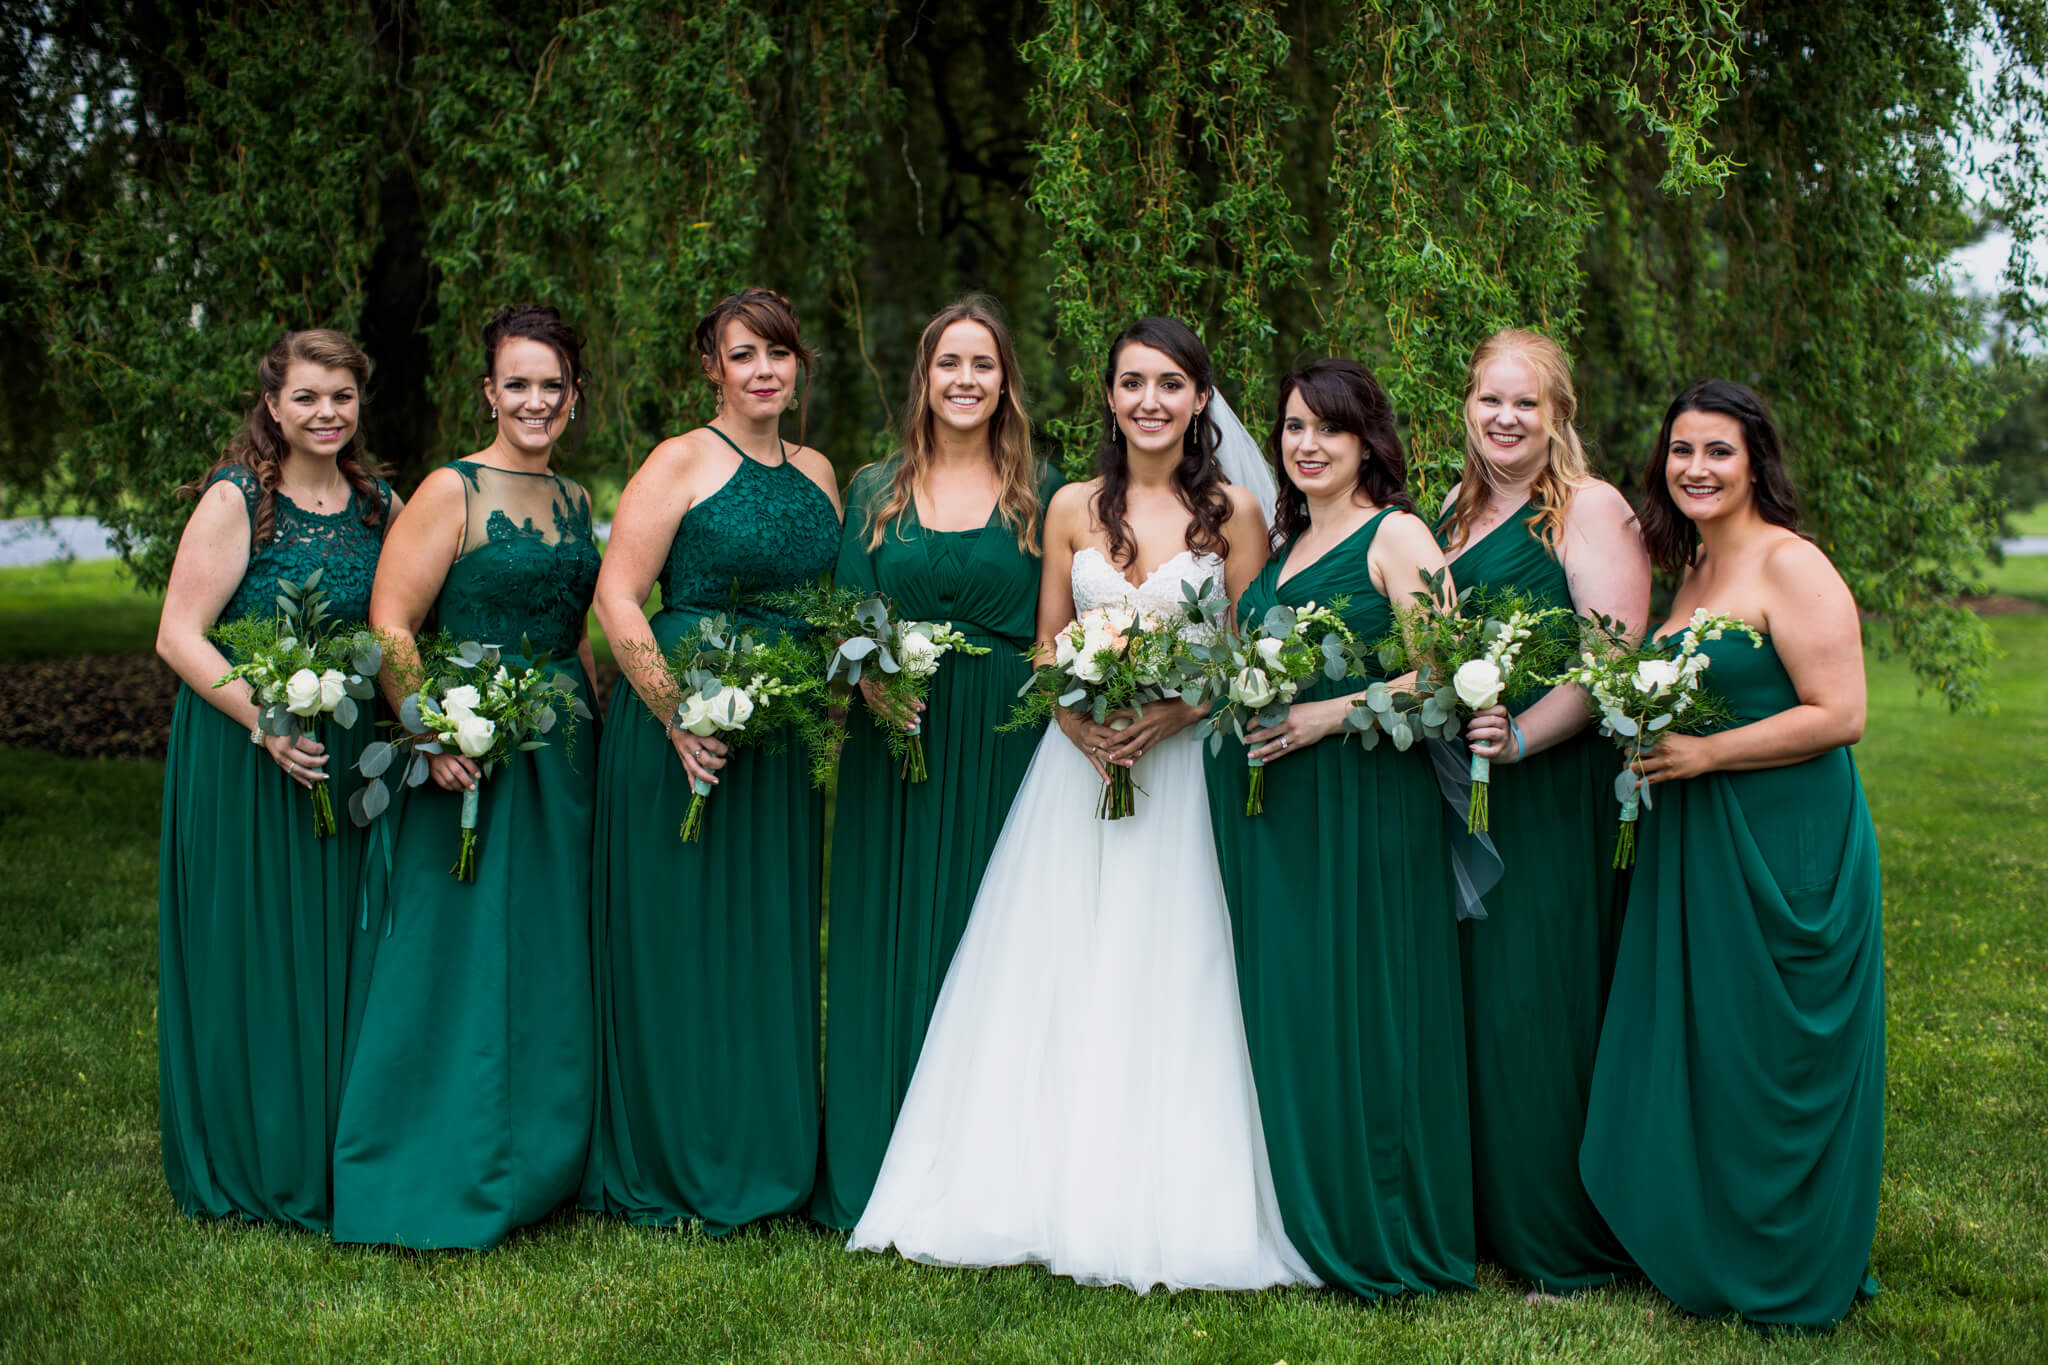 Alysia Jerad Homestead Blessings Farm Hershey PA Wedding Rustic Chique - 62.JPG